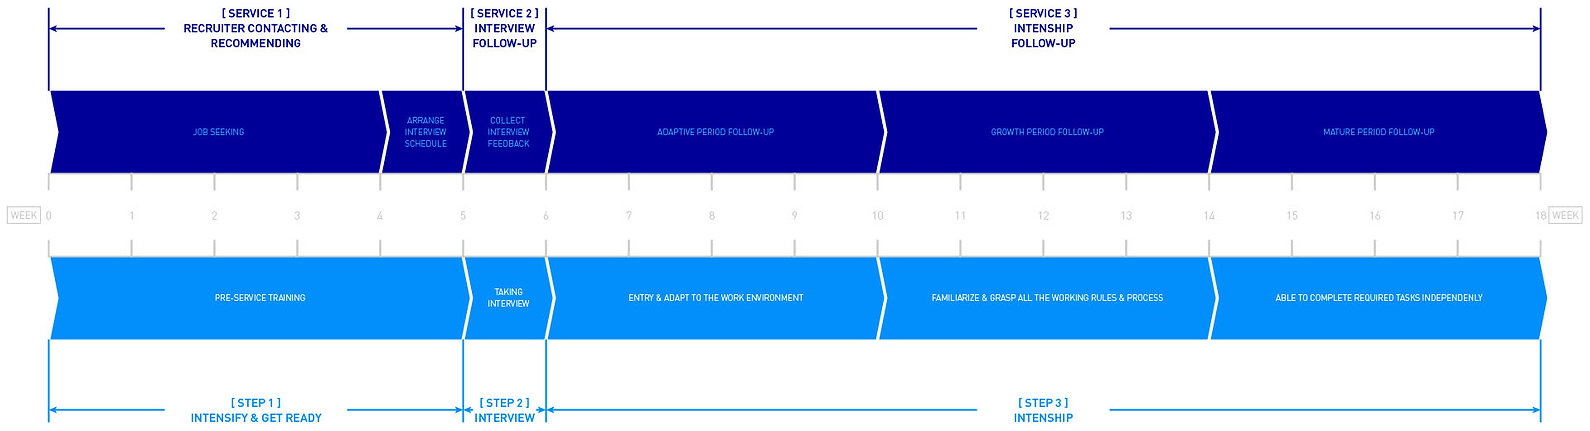 s18-intership-progress.jpg